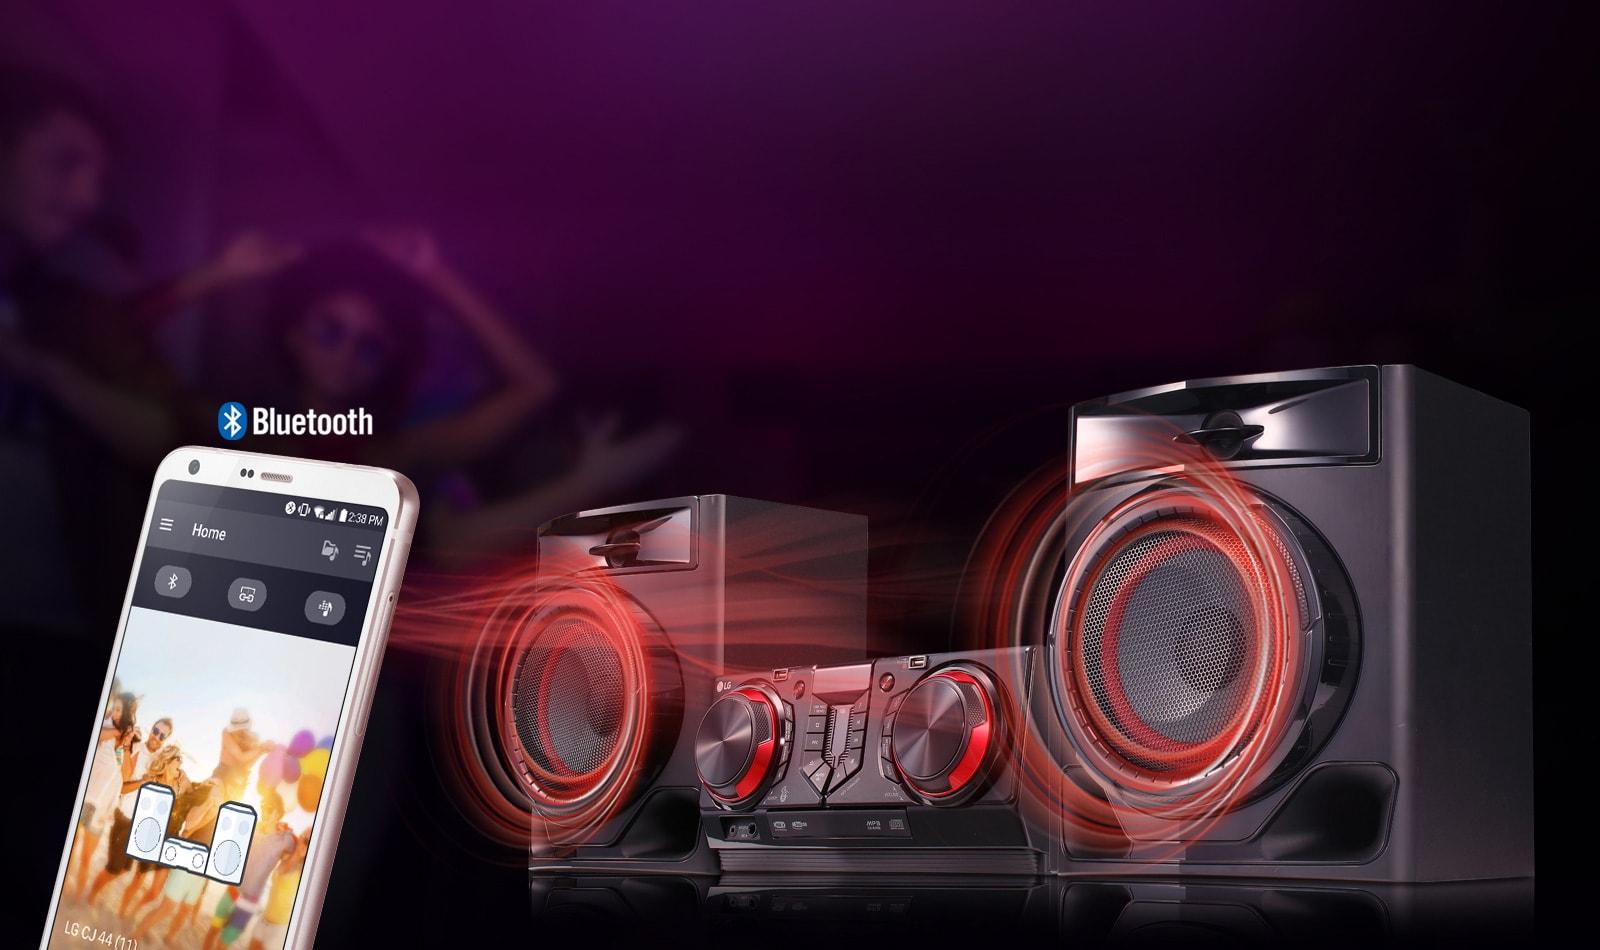 Application Bluetooth LG